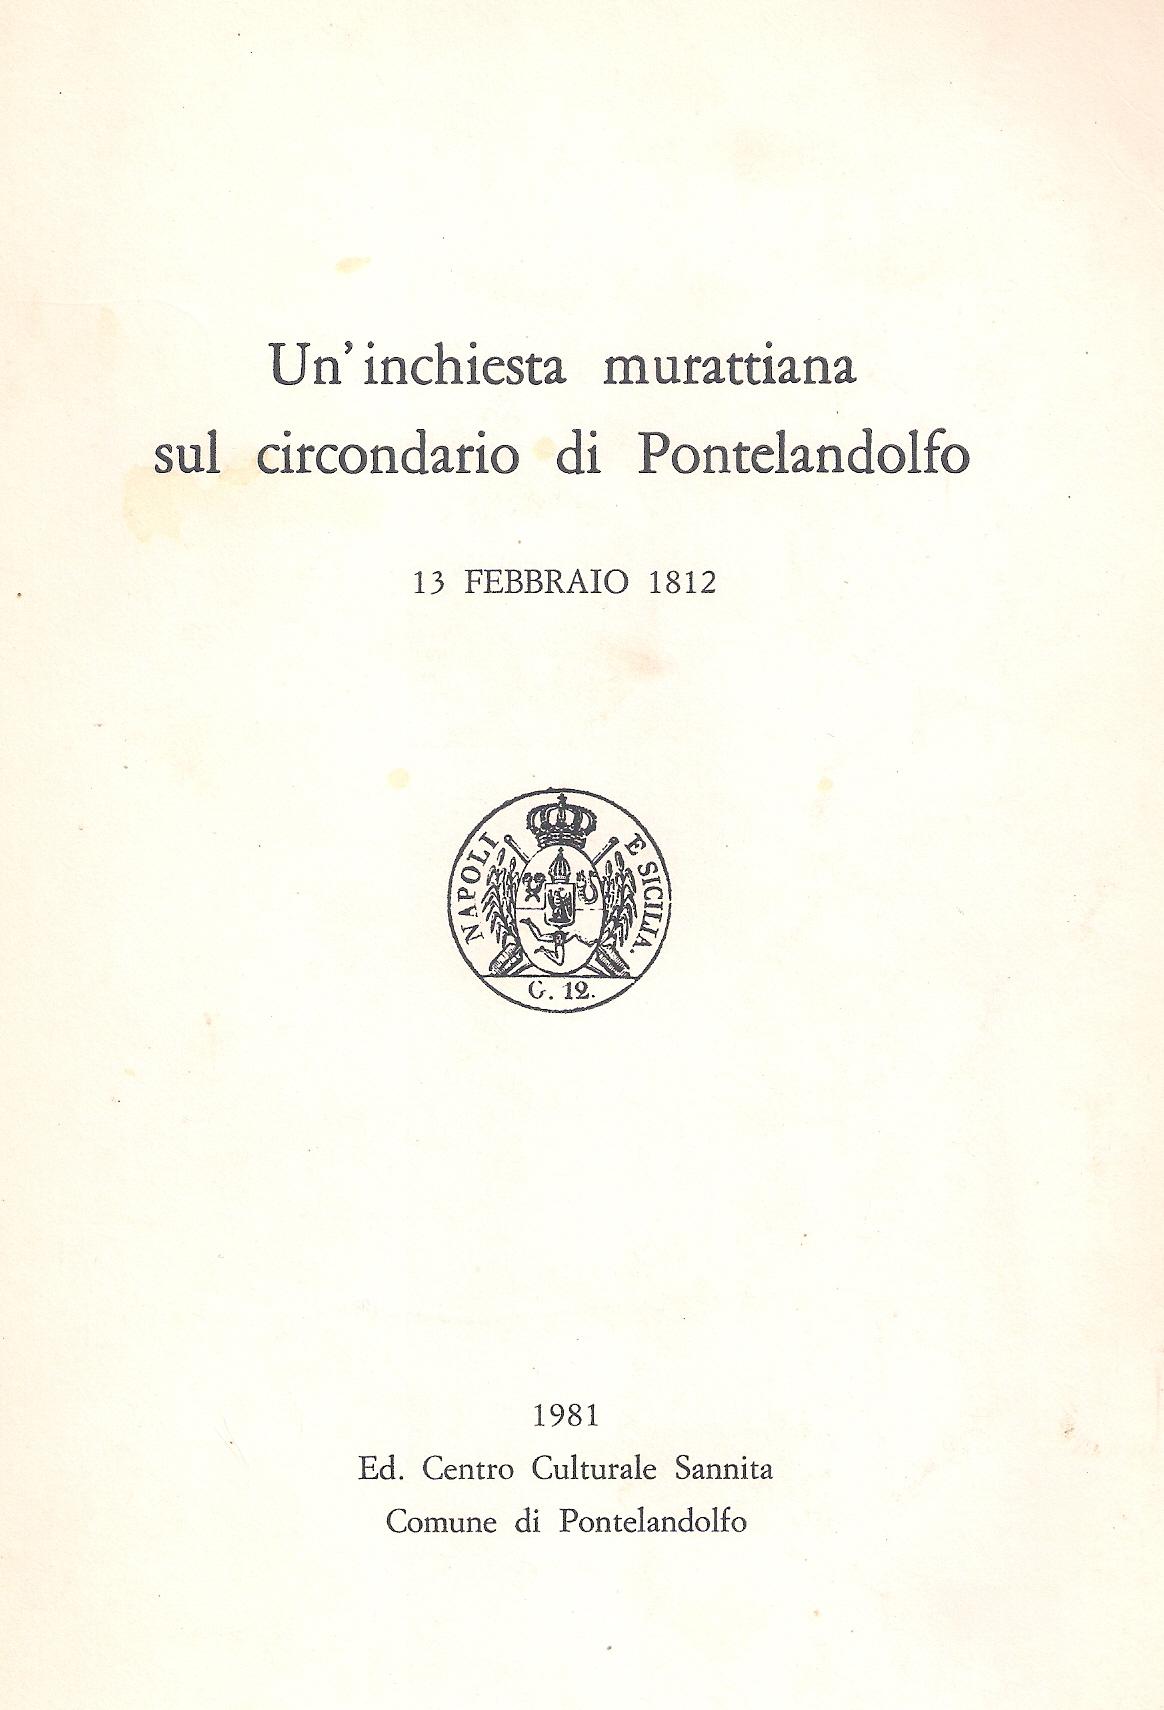 Un'inchiesta murattiana sul circondario di Pontelandolfo